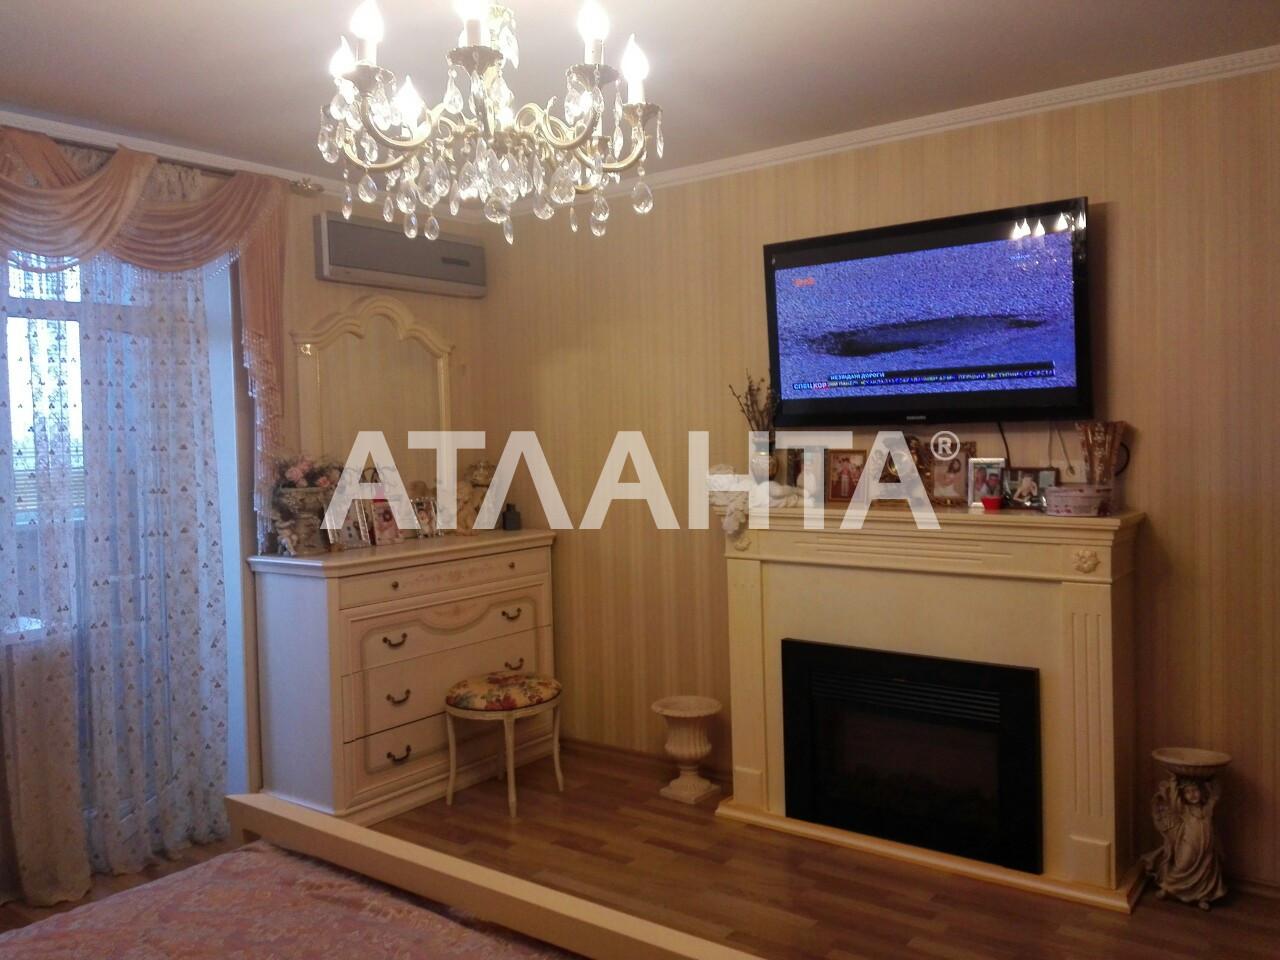 Продается 3-комнатная Квартира на ул. Бабаджаняна Марш. (Рекордная) — 100 000 у.е. (фото №4)